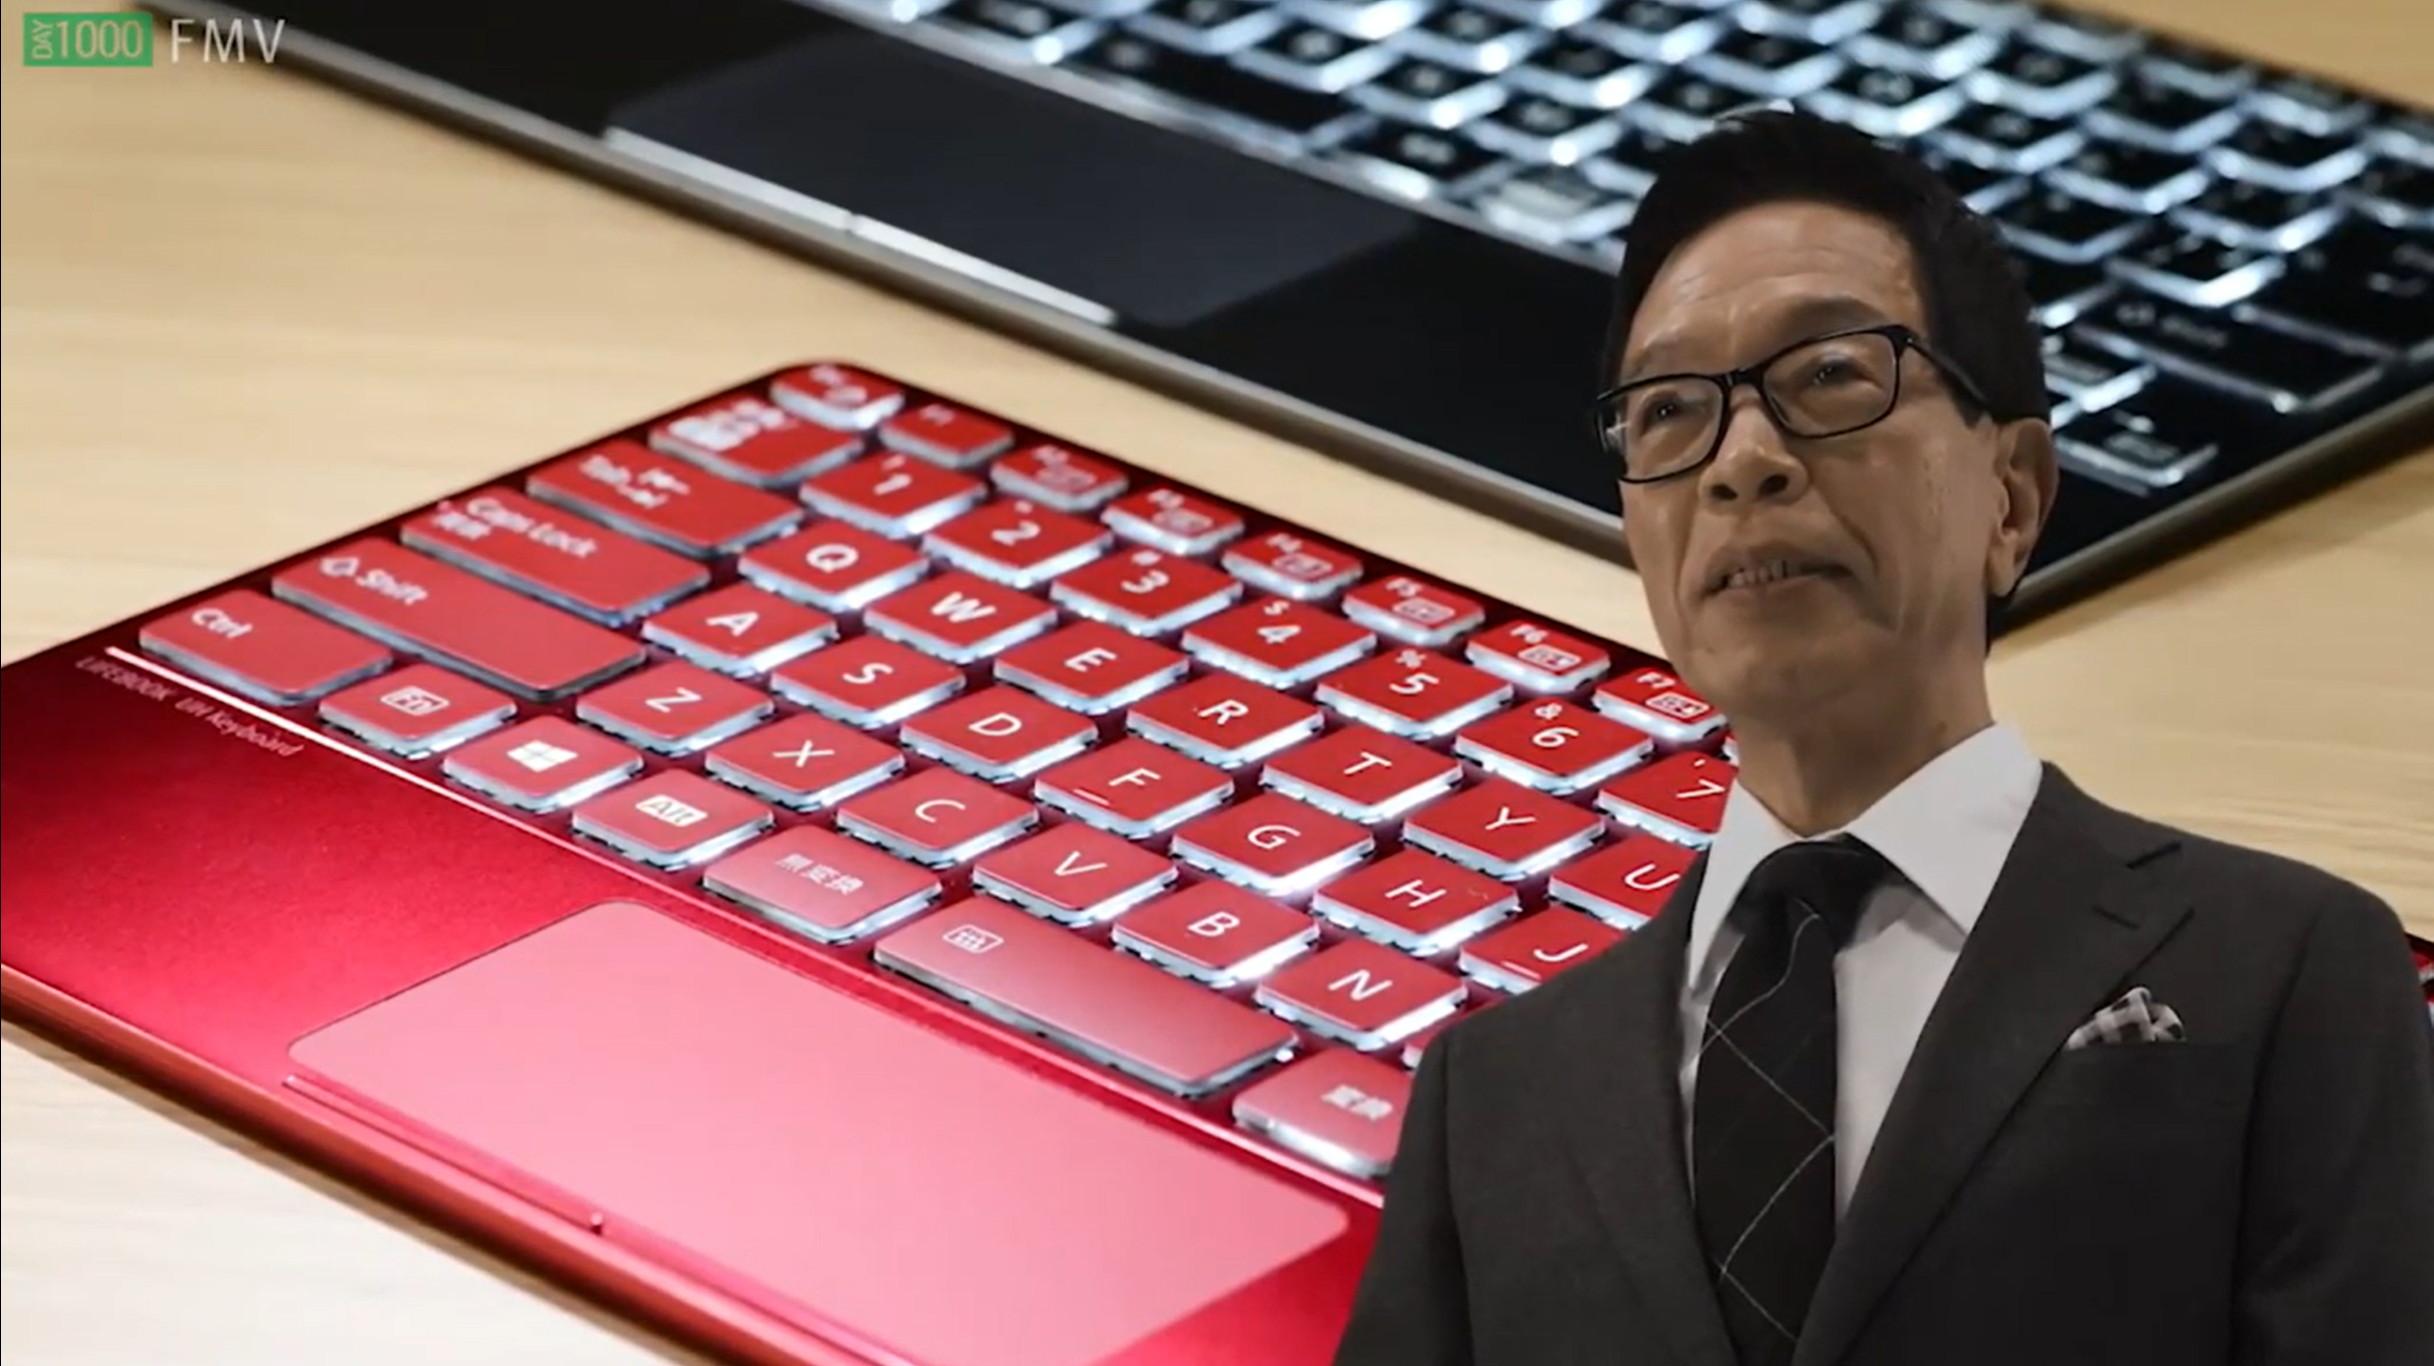 FMV UH Keyboard